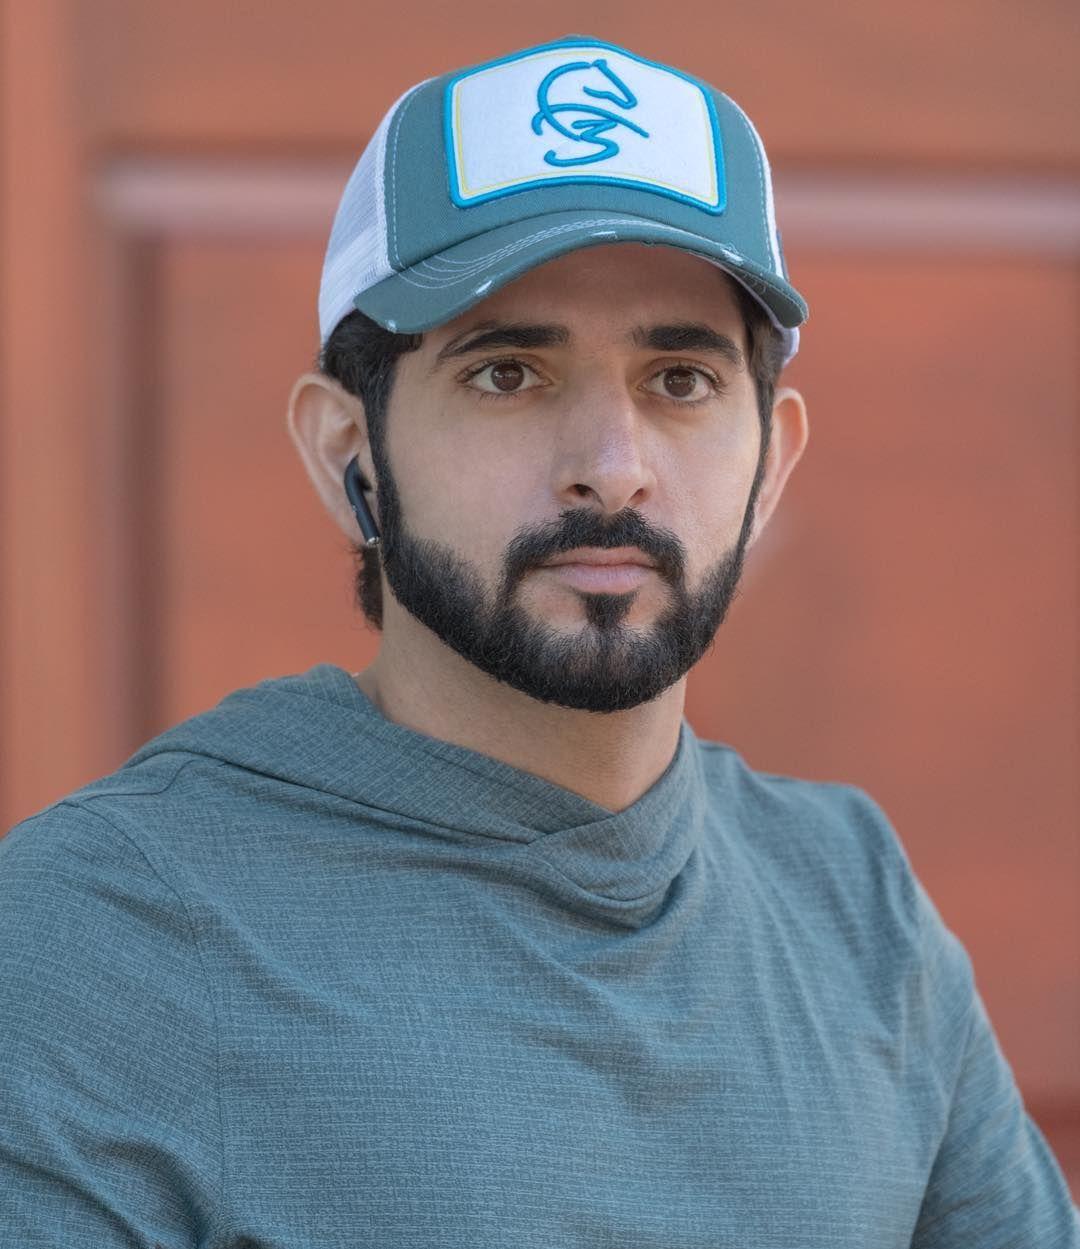 Hamdan Bin Mohammed Bin Rashid Al Maktoum 03 02 2018 Via F3